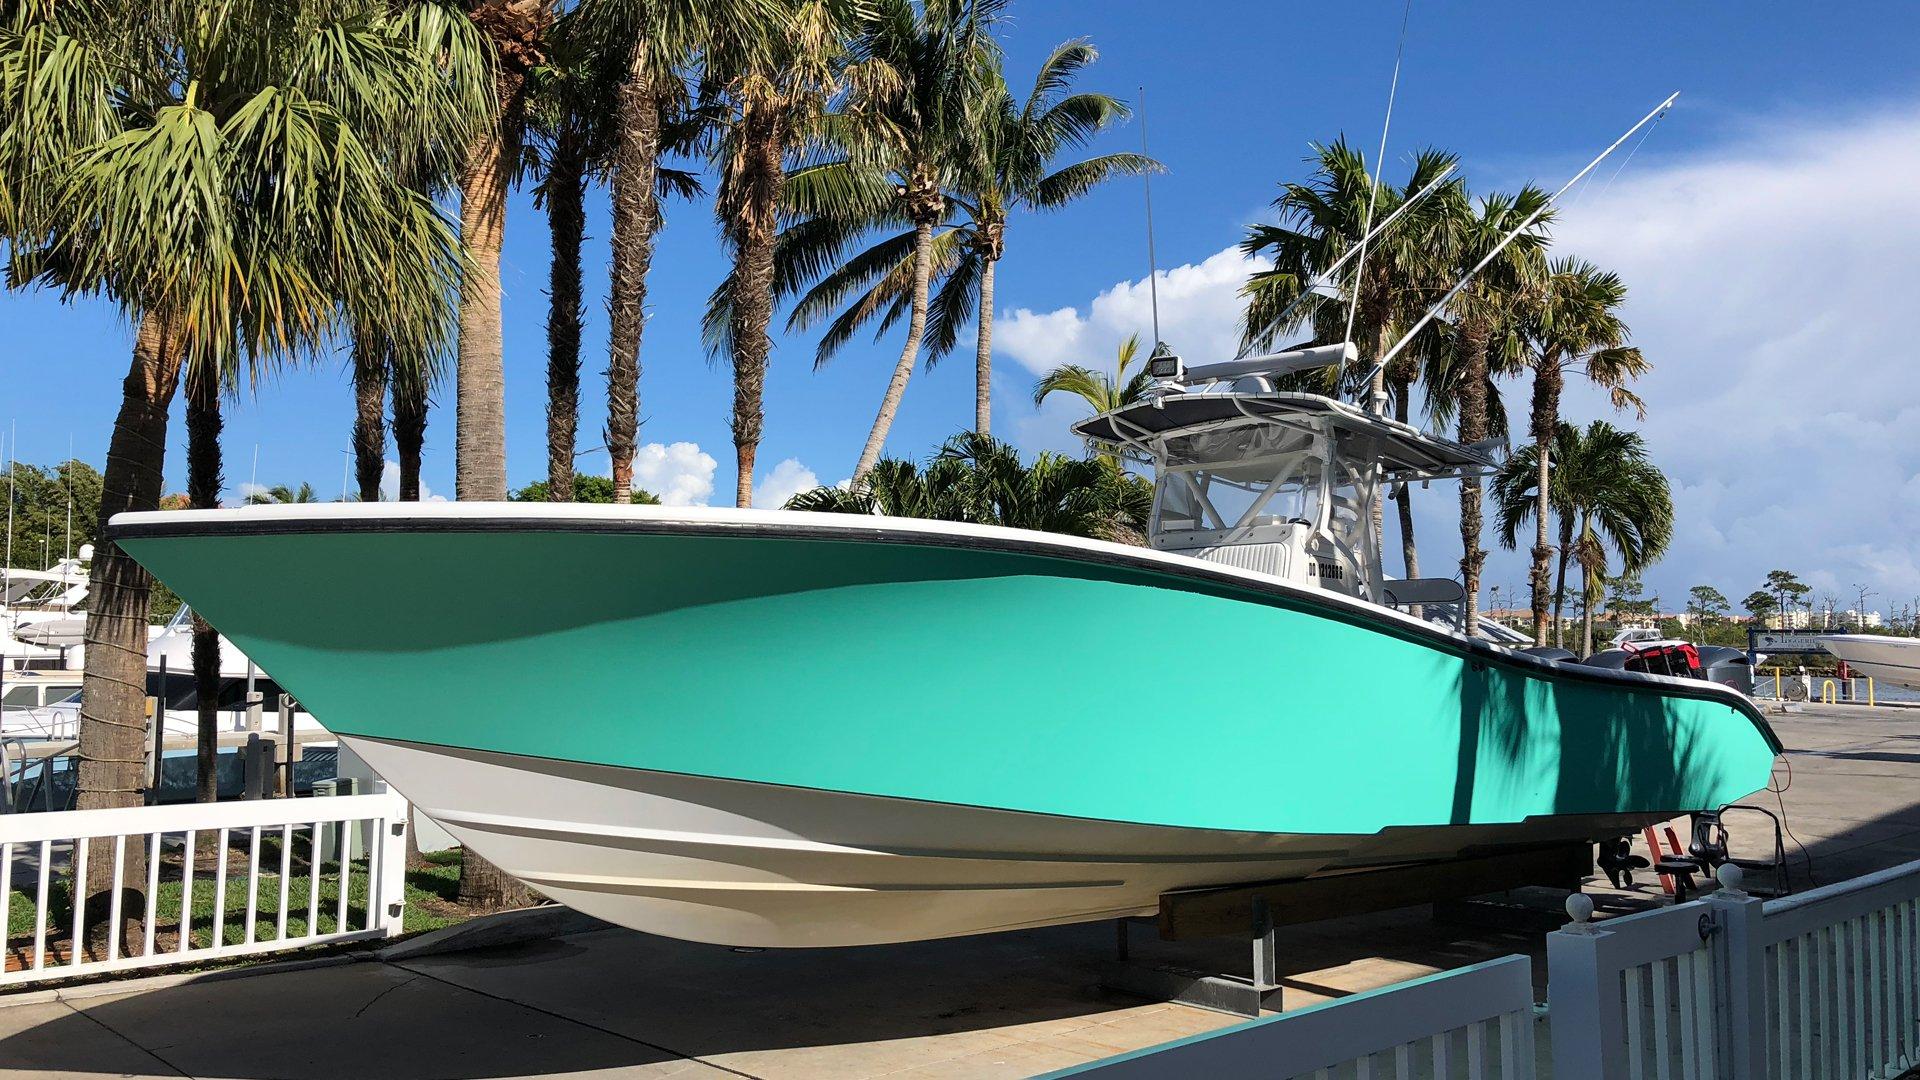 CRDWraps.com Boat Wrap West Palm Beach